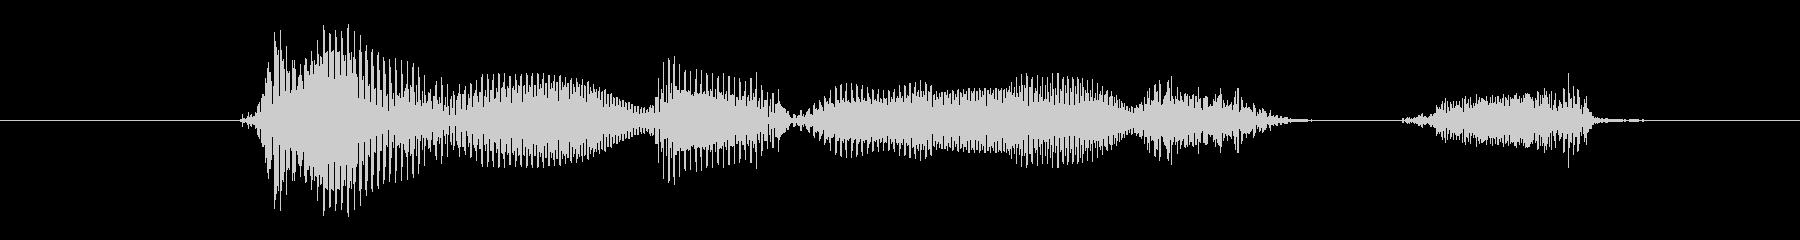 worked hard's unreproduced waveform